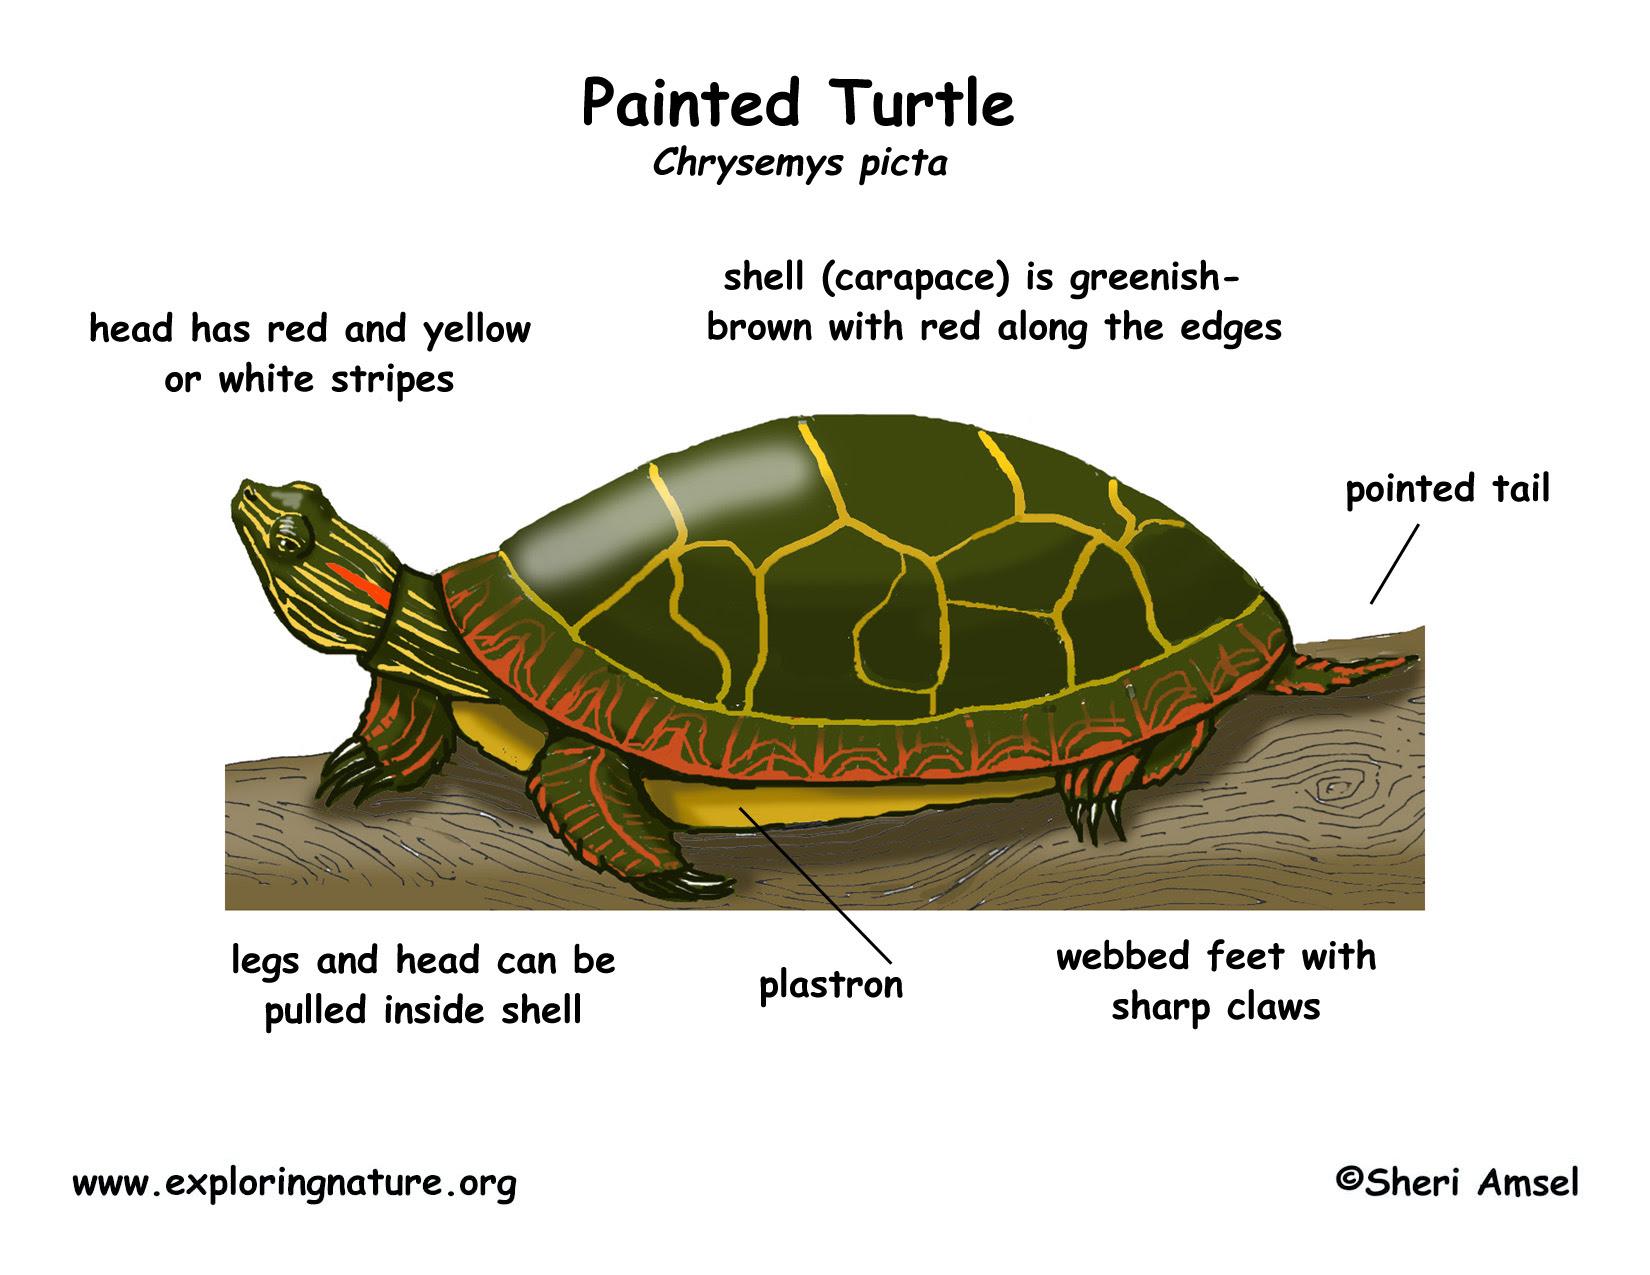 turtle_painted_diagram